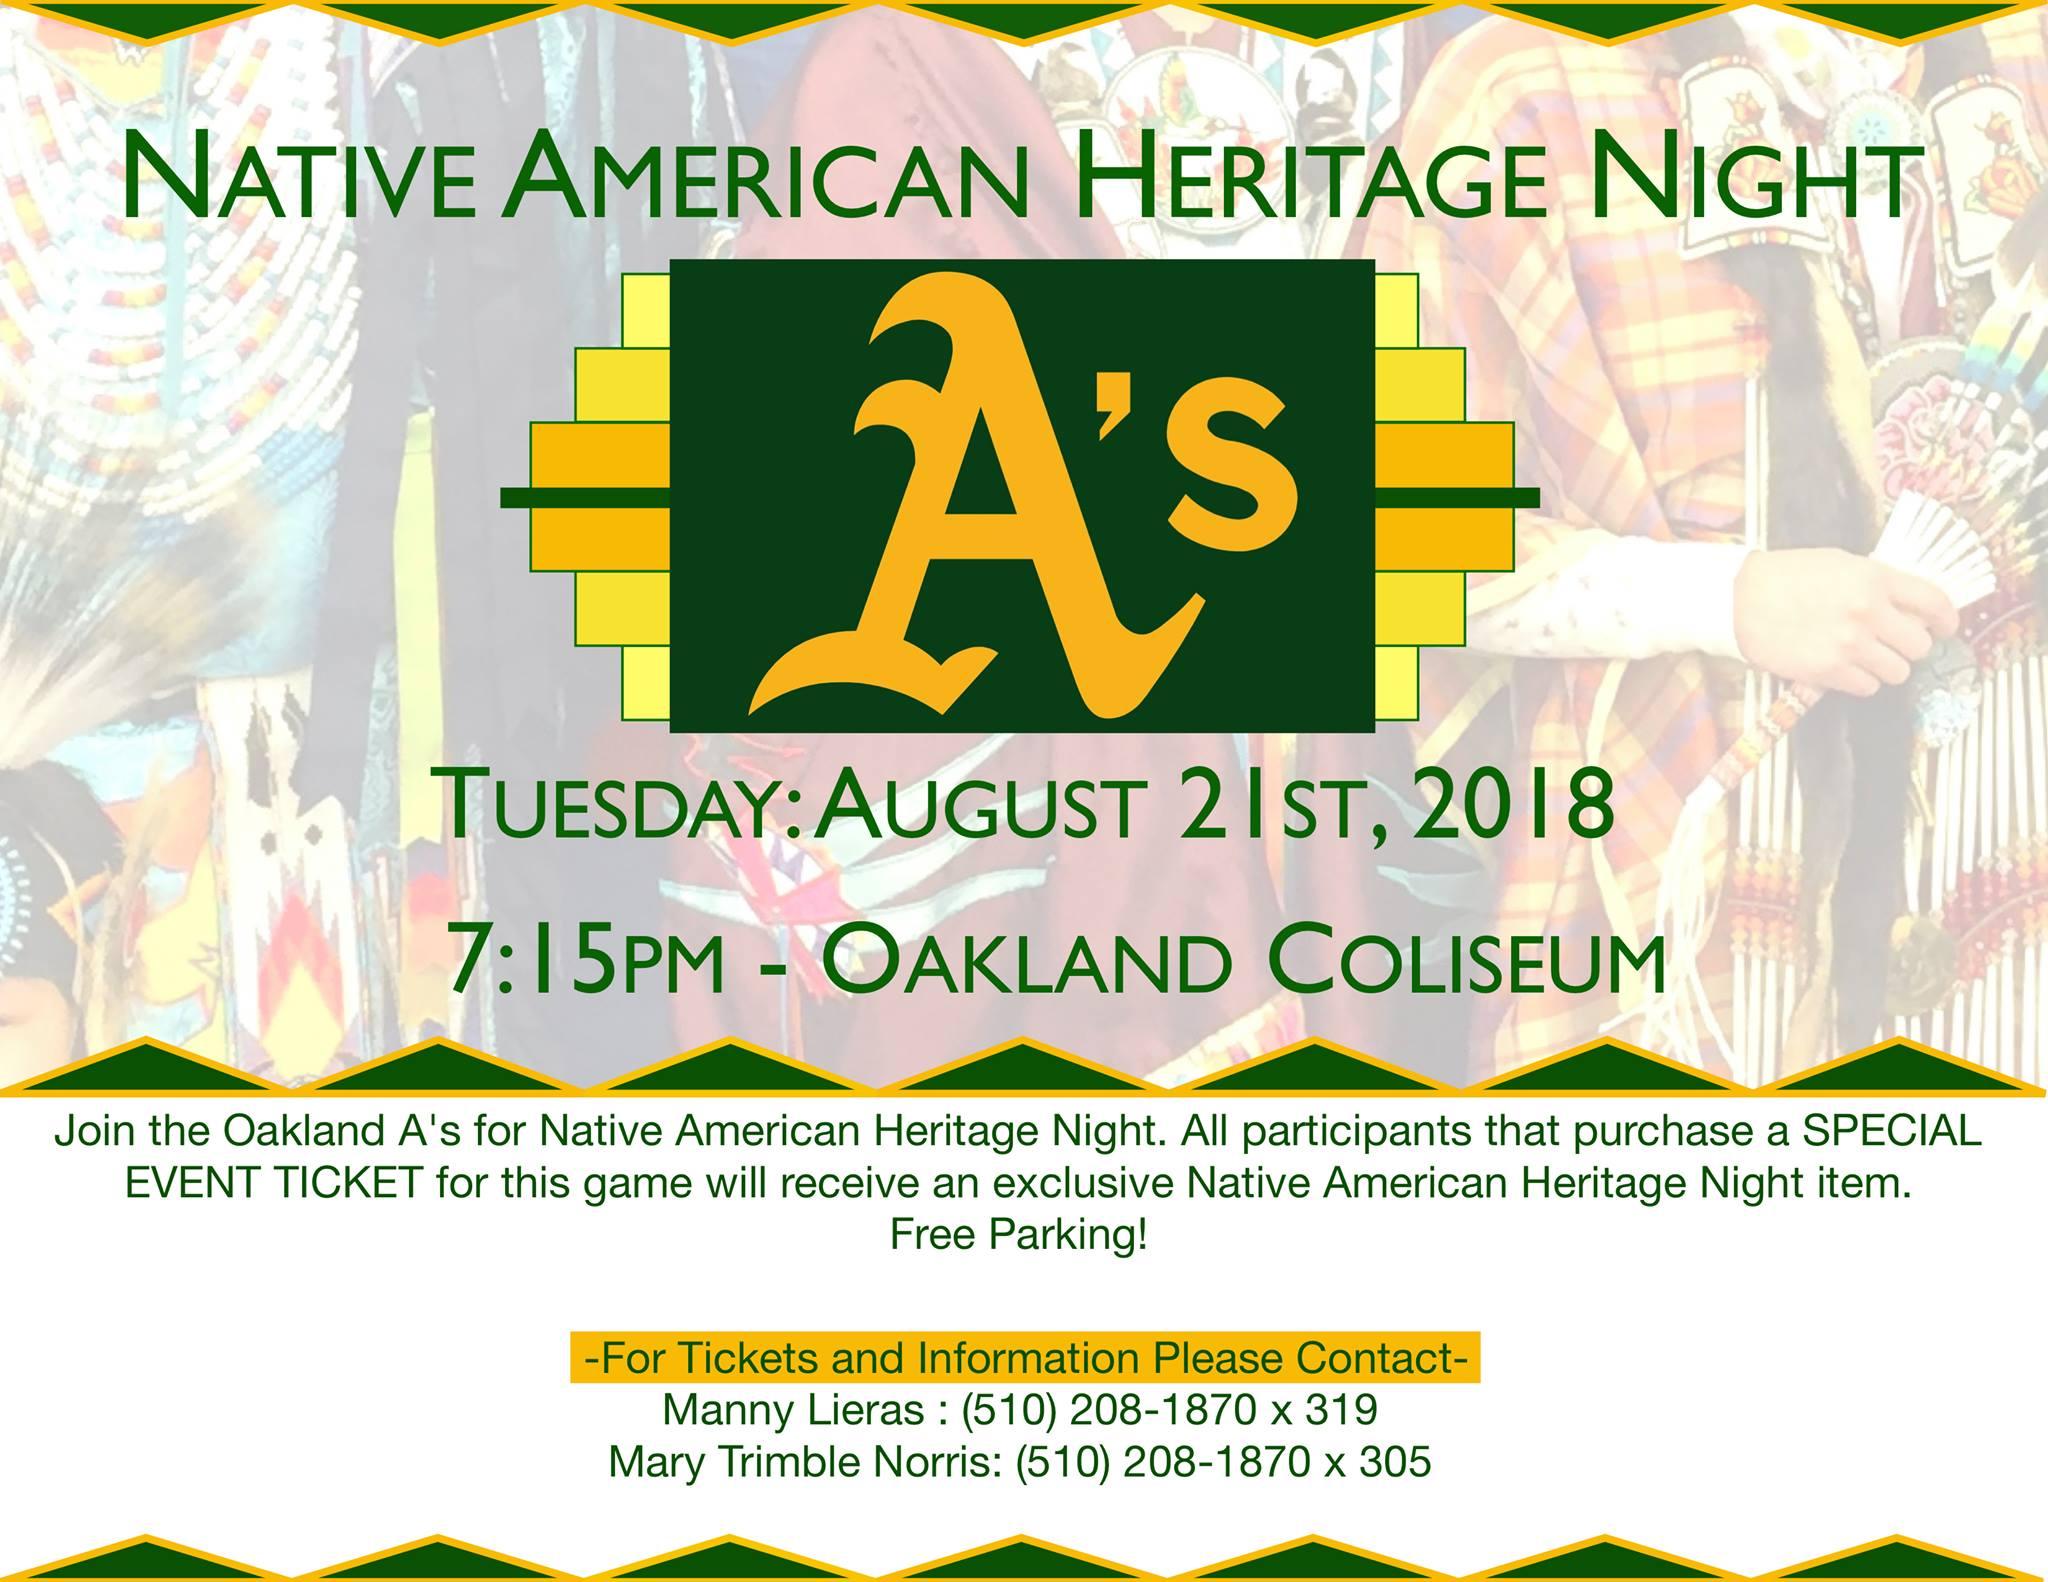 OaklandA_Native American Heritage Night_Flier.jpg